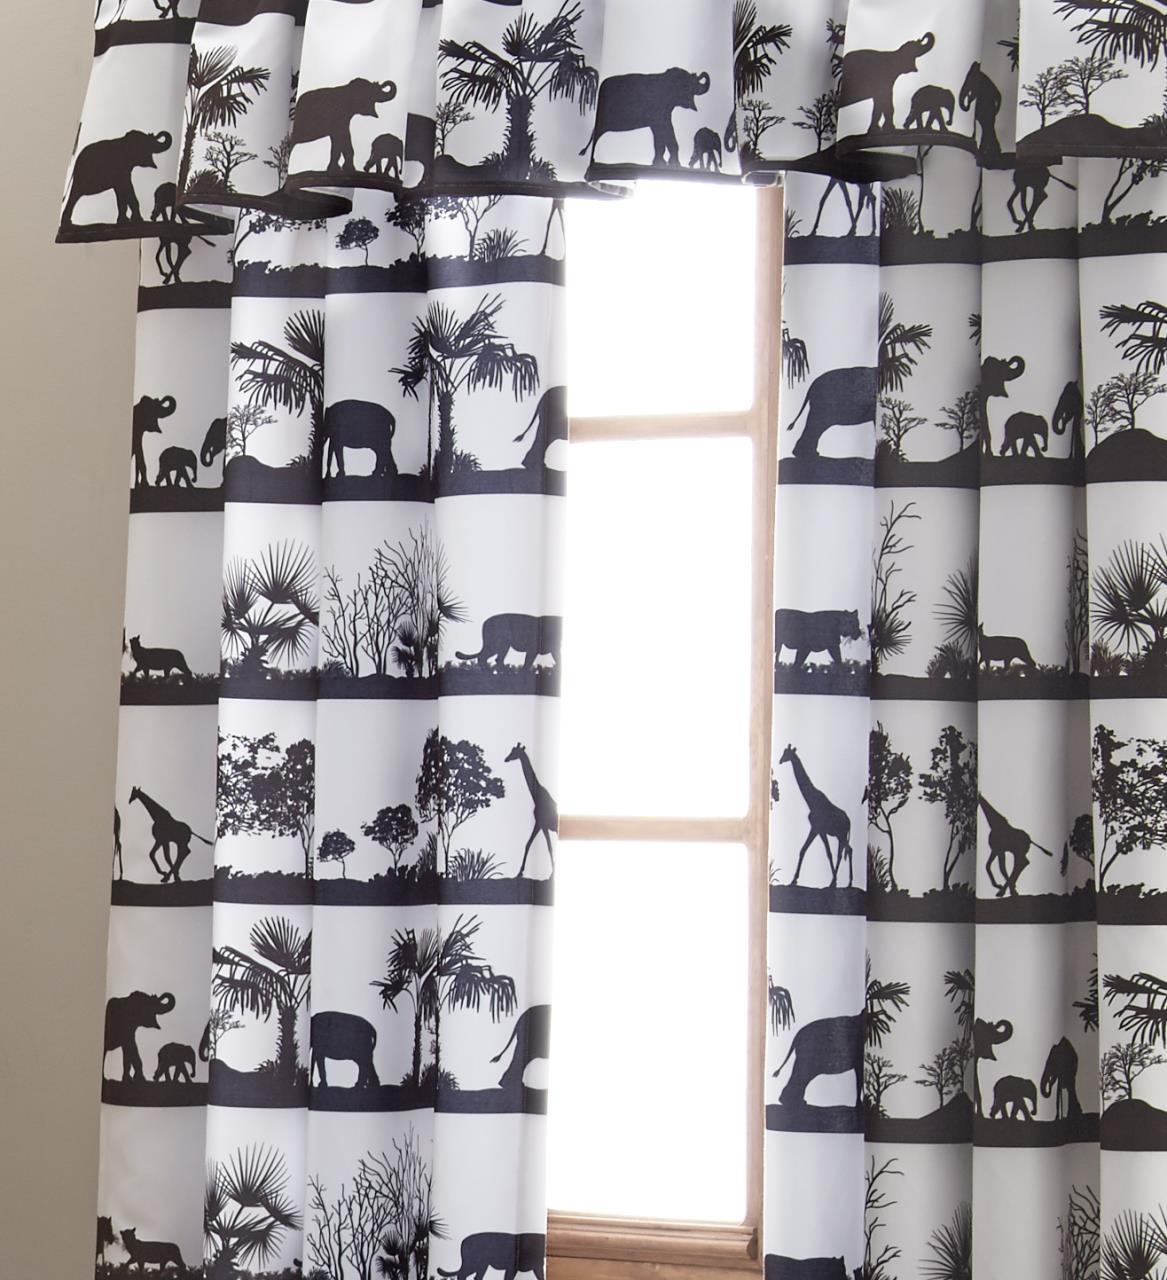 African Safari Curtain Panel - 626300115758